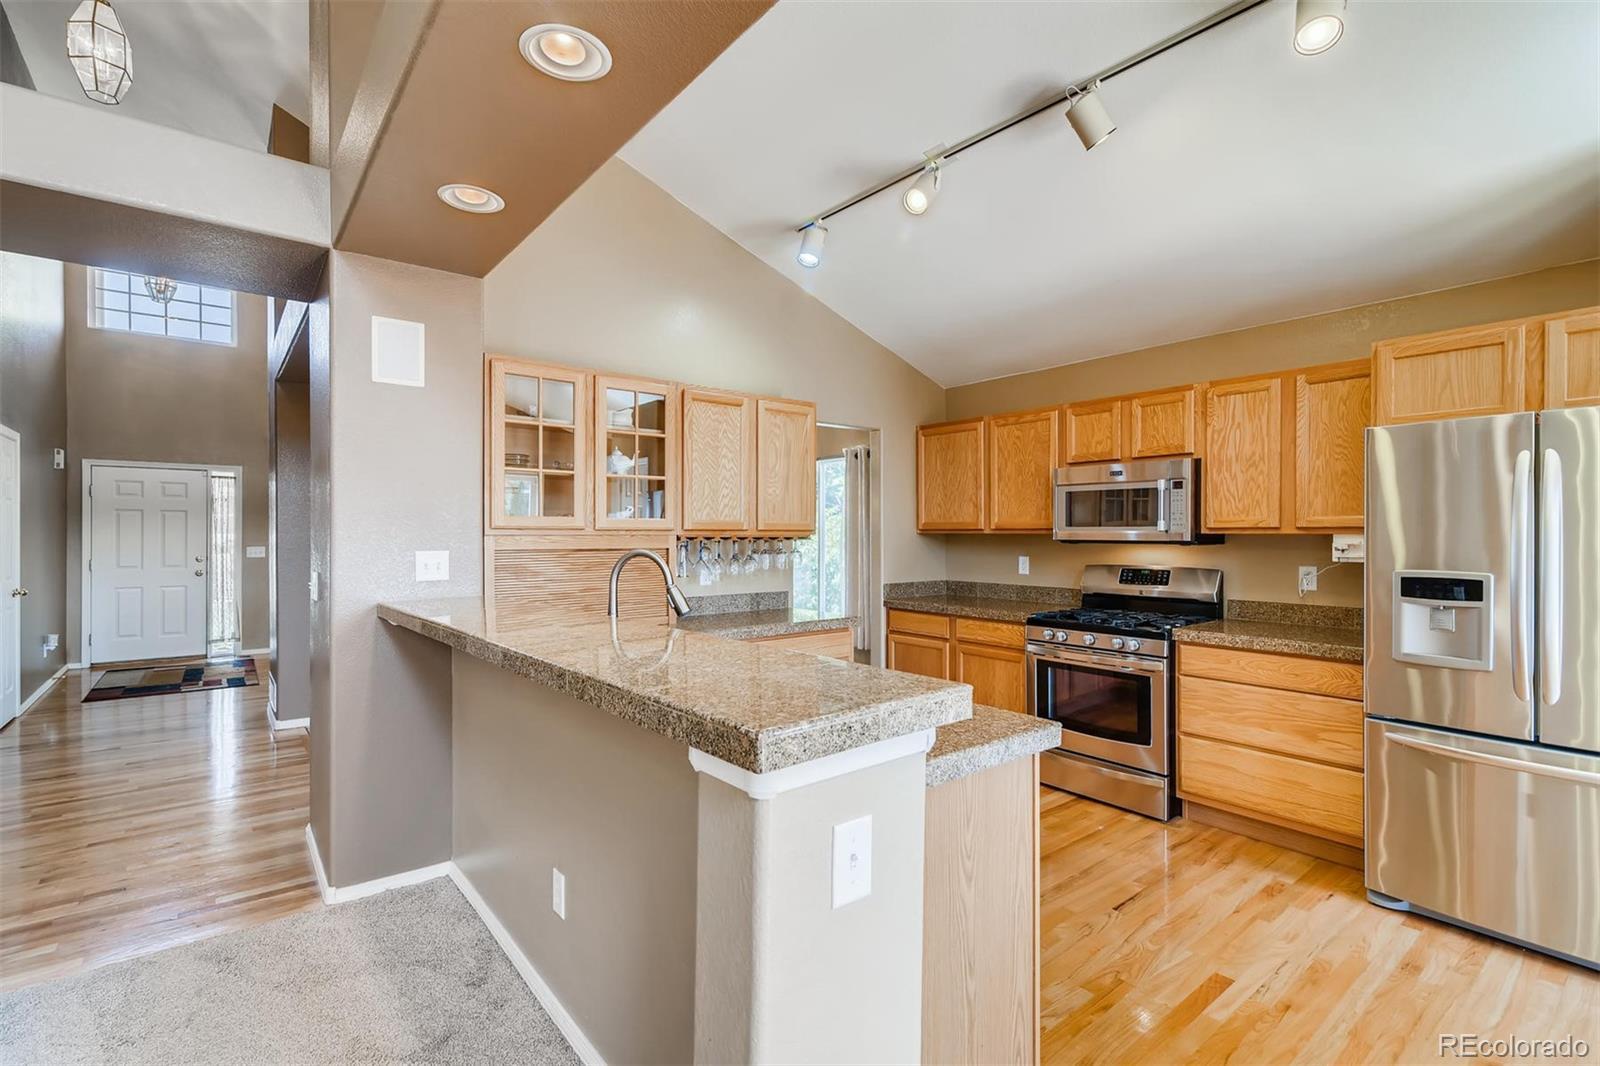 MLS# 9724731 - 9 - 498 Promontory Drive, Loveland, CO 80537